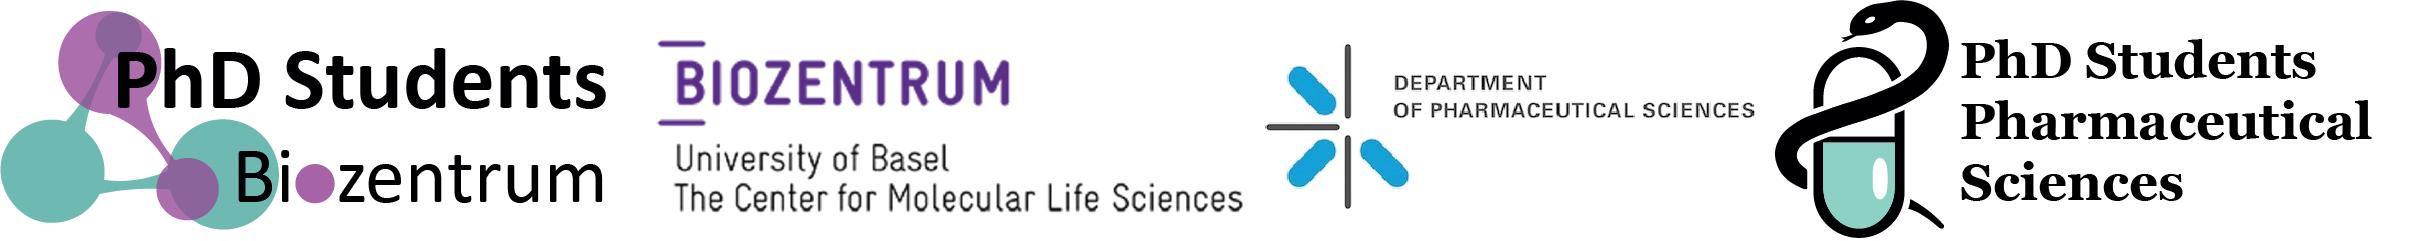 PhD Students Biozentrum